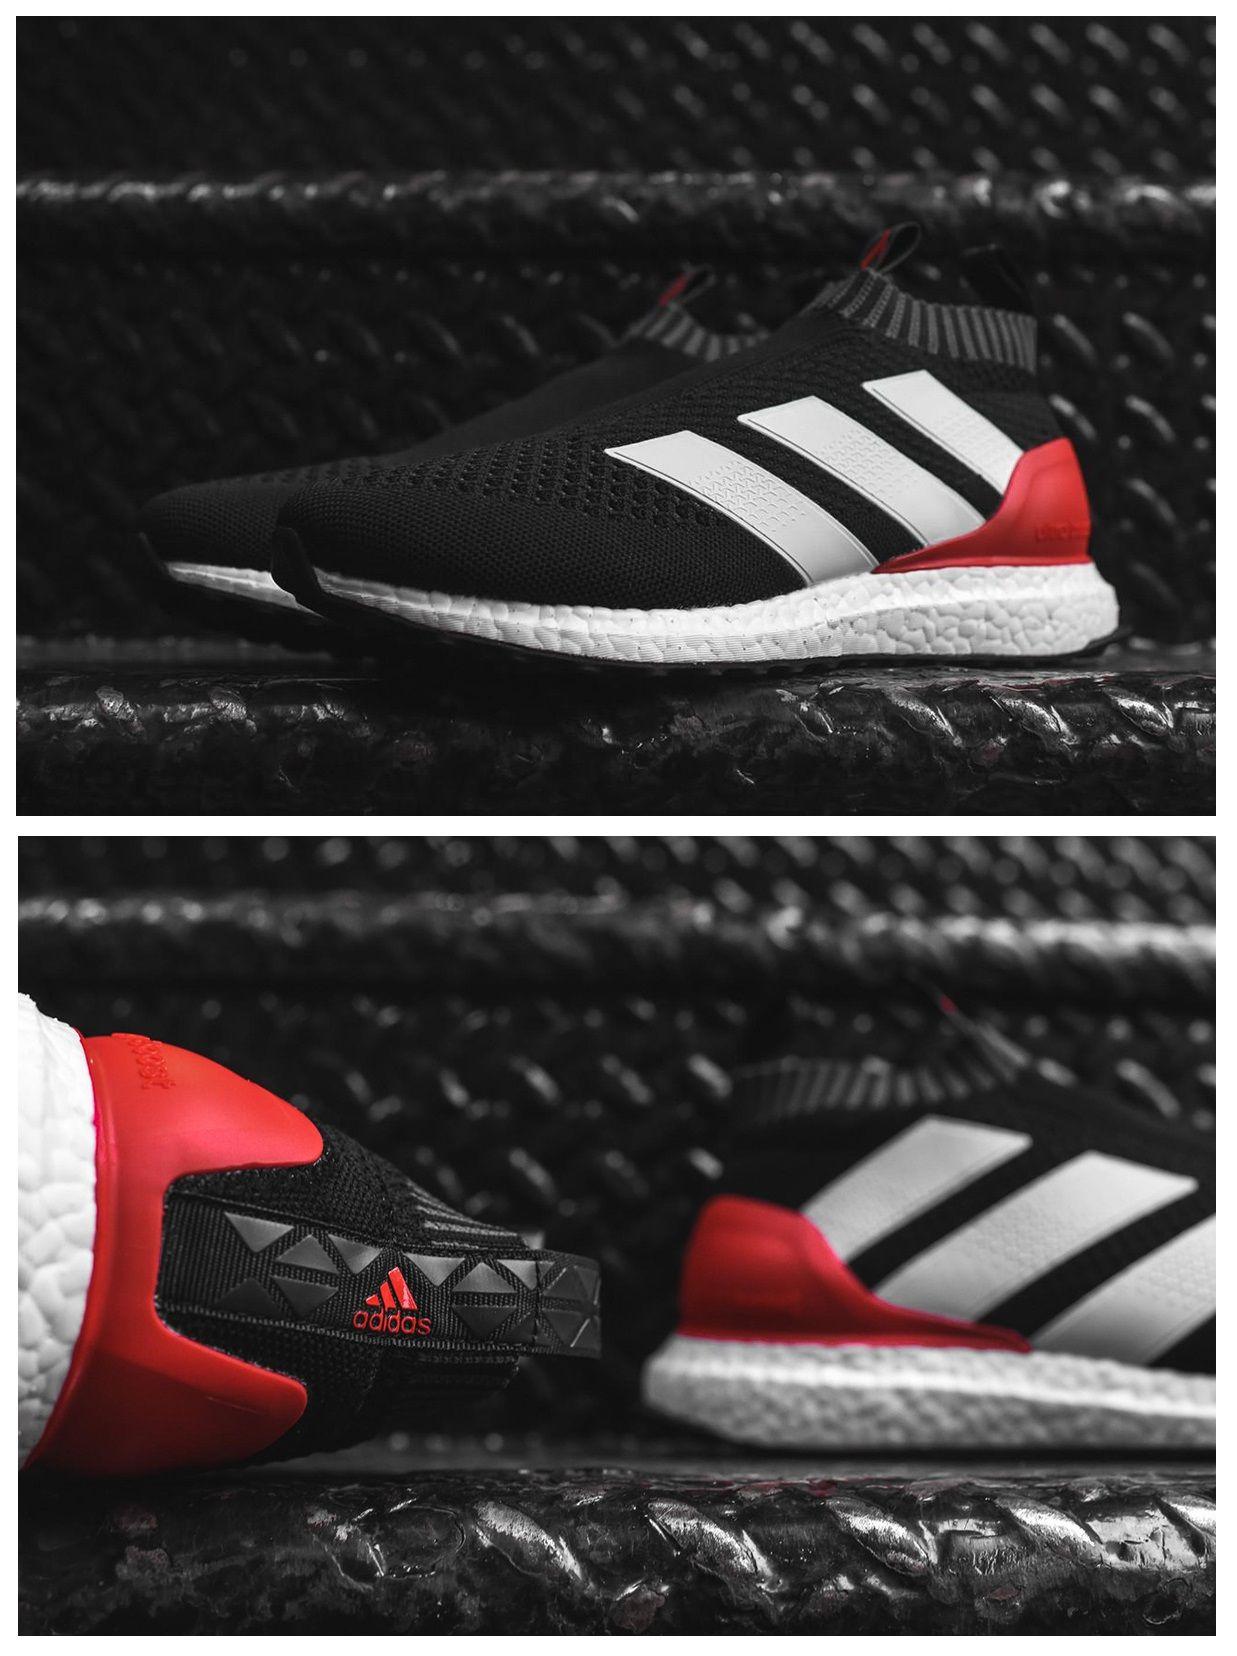 uk availability 51681 af7fa adidas Ace 17+ Pure Control Ultra Boost | Adidas Originals ...